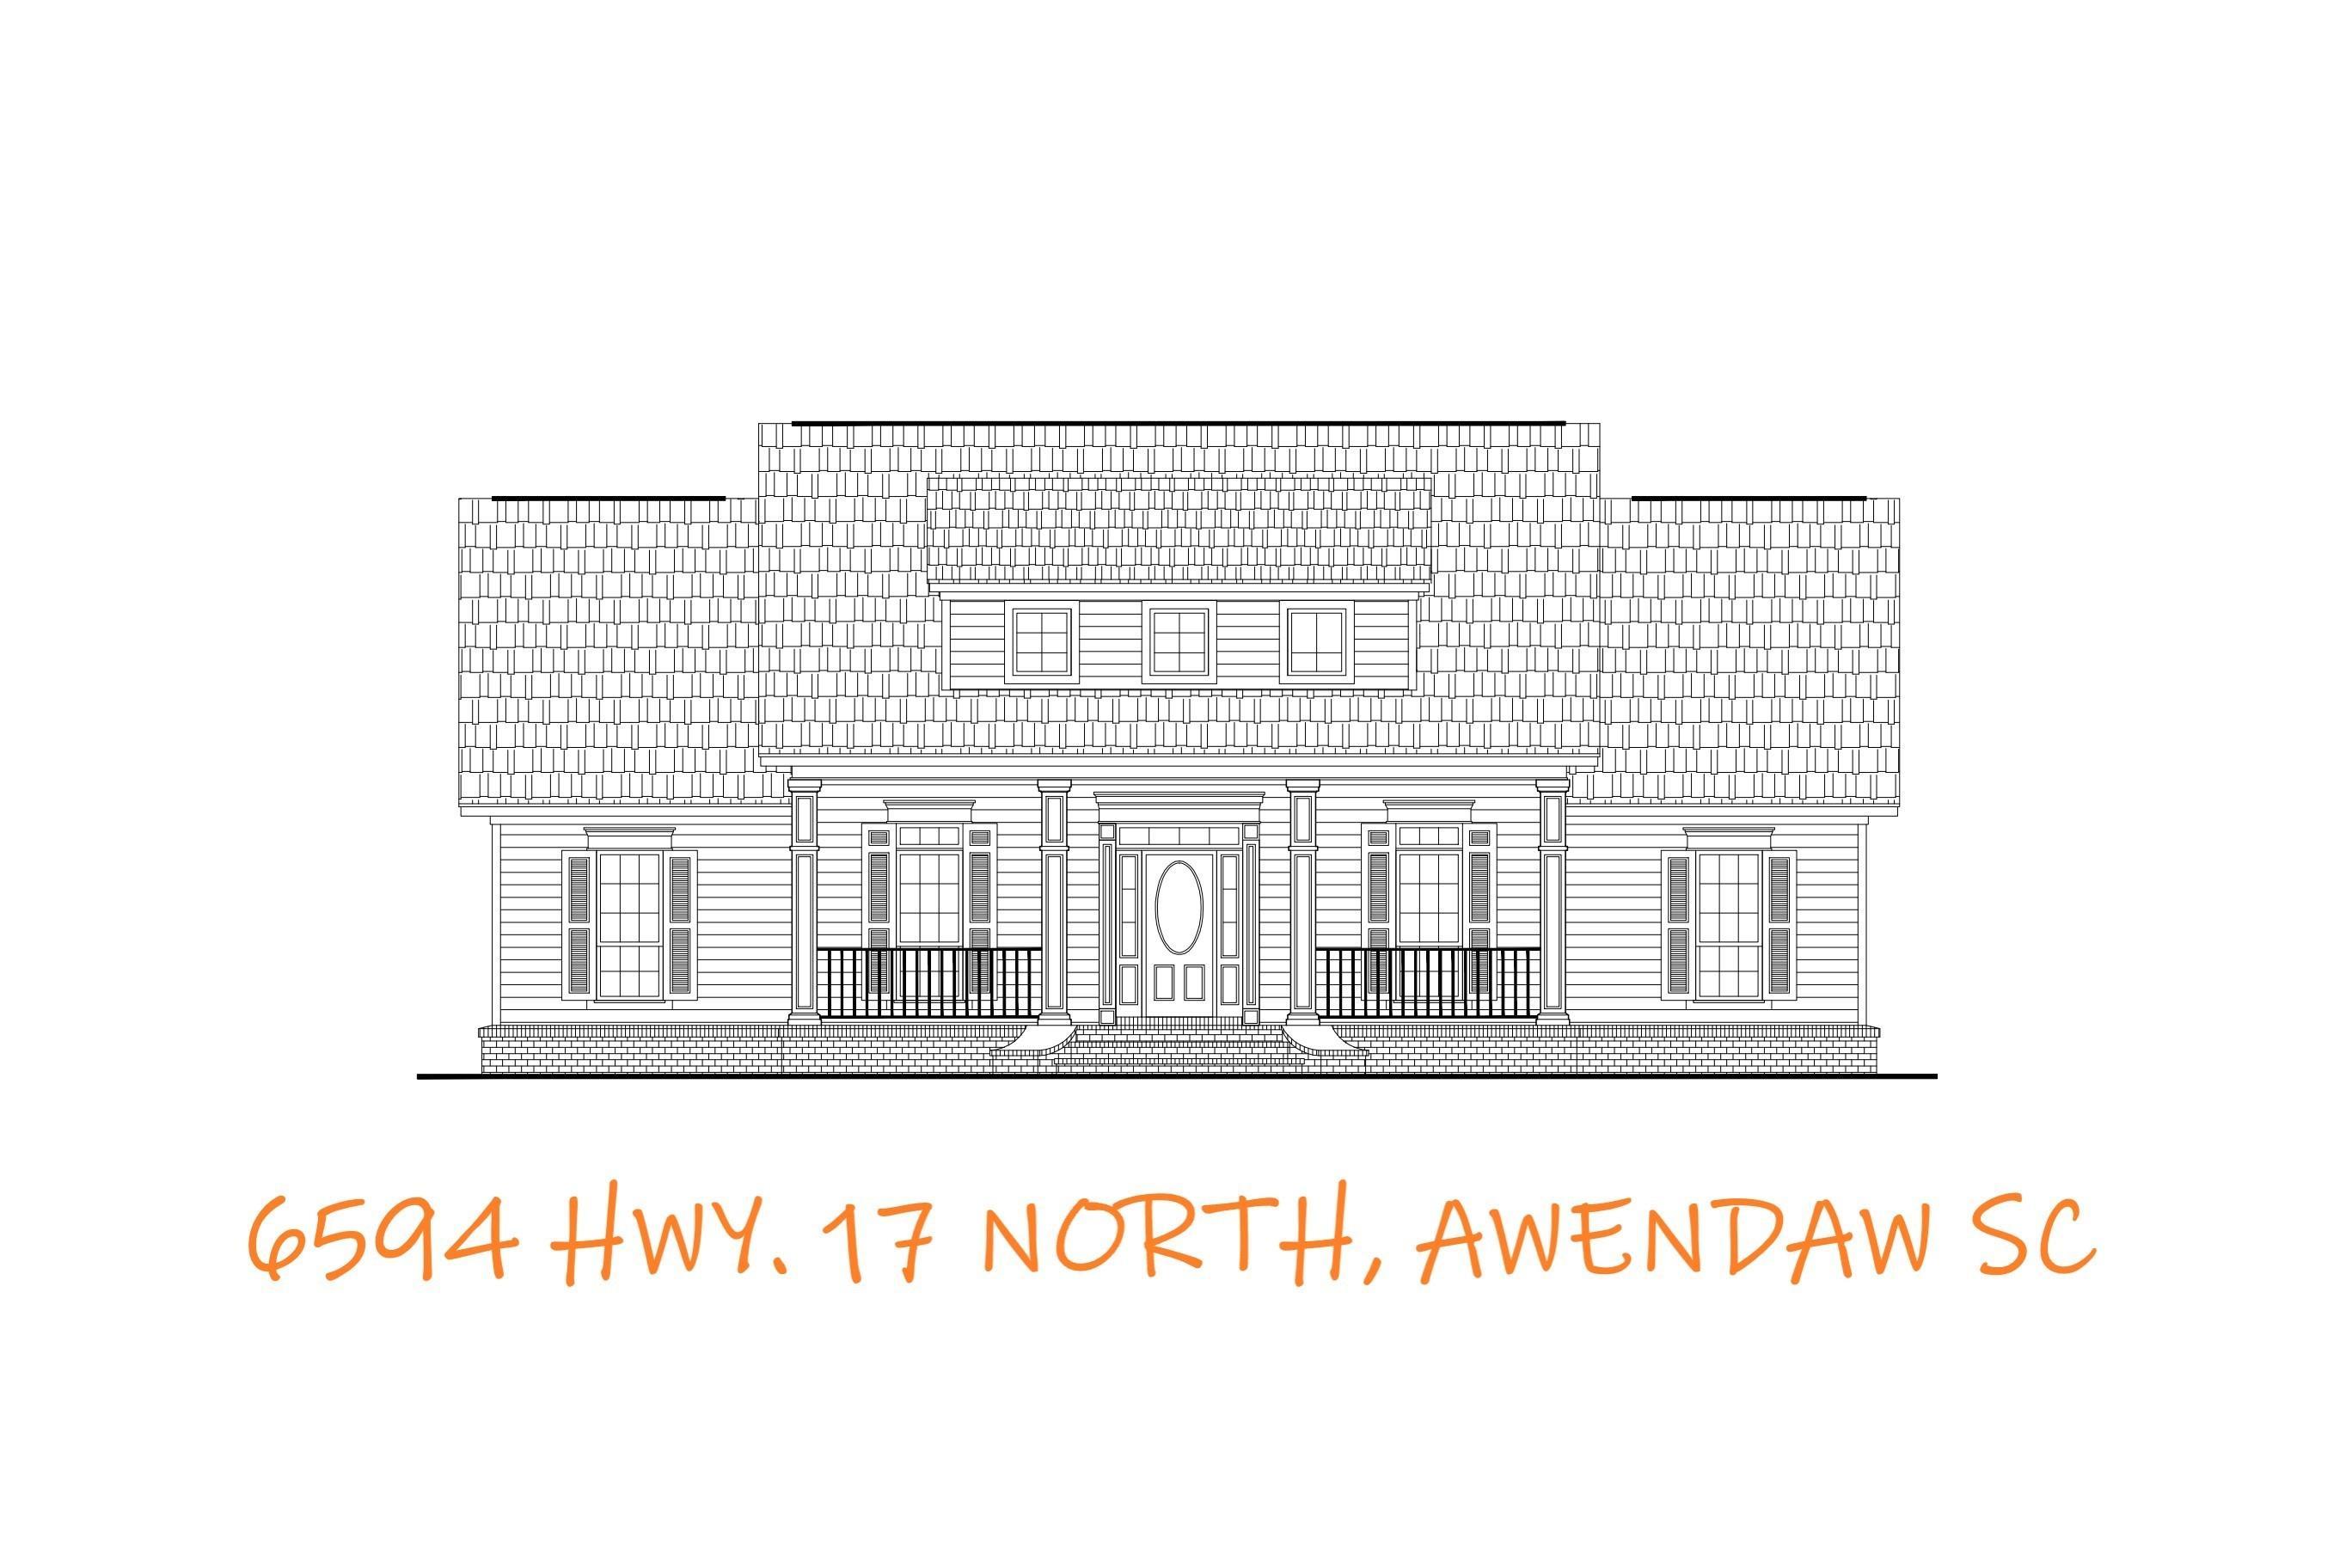 6594 N Highway 17 Awendaw, SC 29429